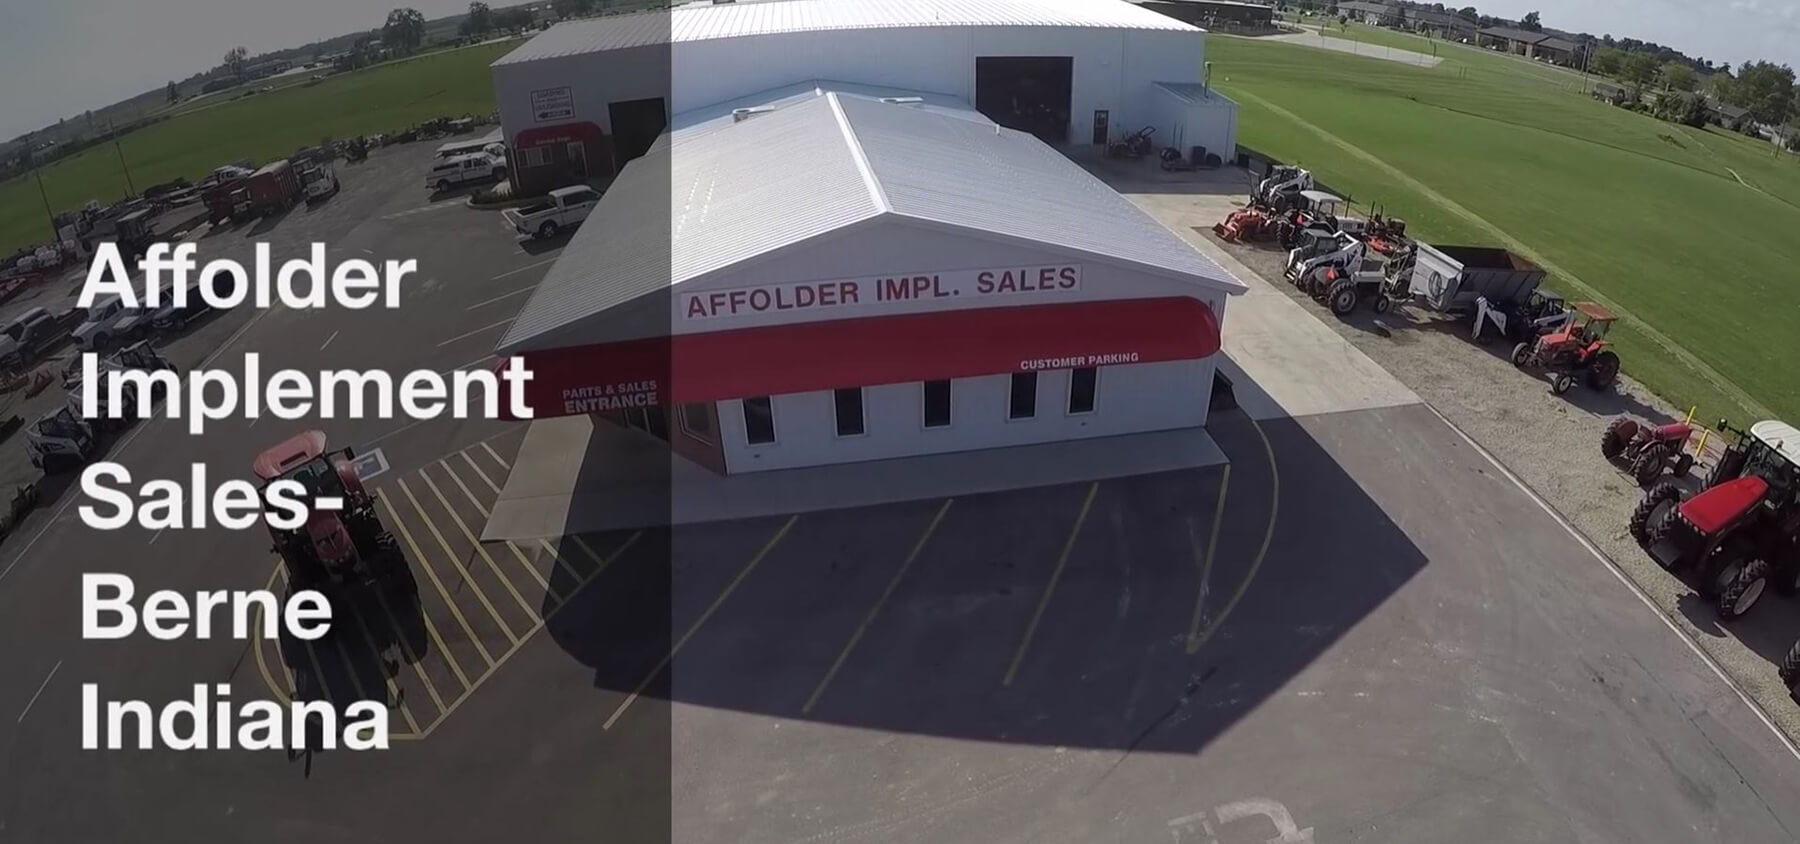 Affolder Implement Sales, Inc  | Sales-Service-Parts | Berne, IN